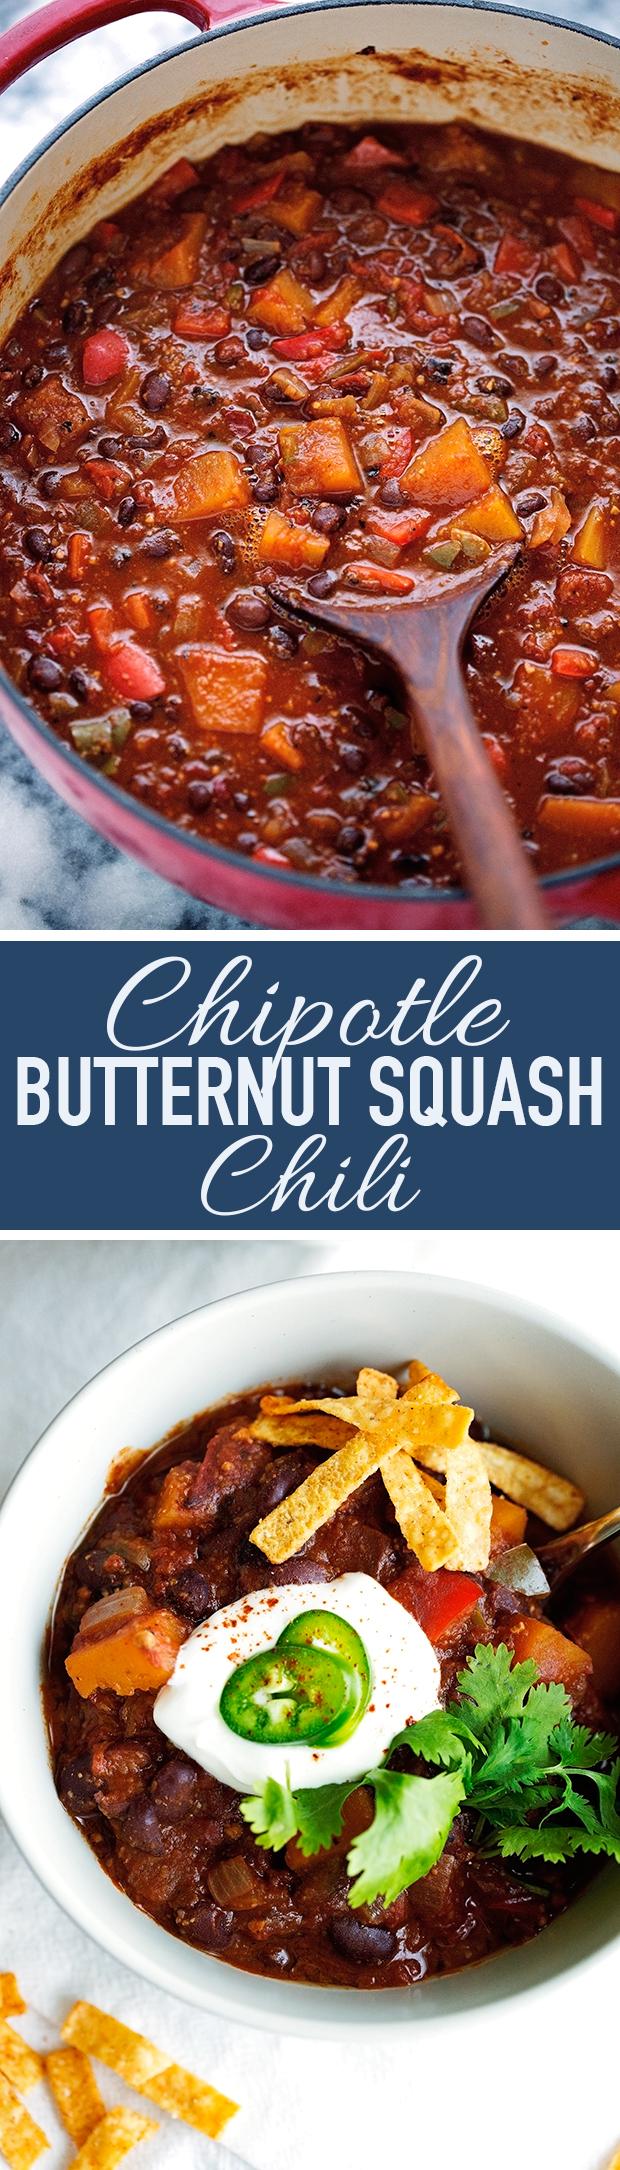 Chipotle Butternut Squash Chili - completely vegan but so hearty and delicious! #veganchili #butternutsquashchili #chipotlechili   littlespicejar.com @littlespicejar